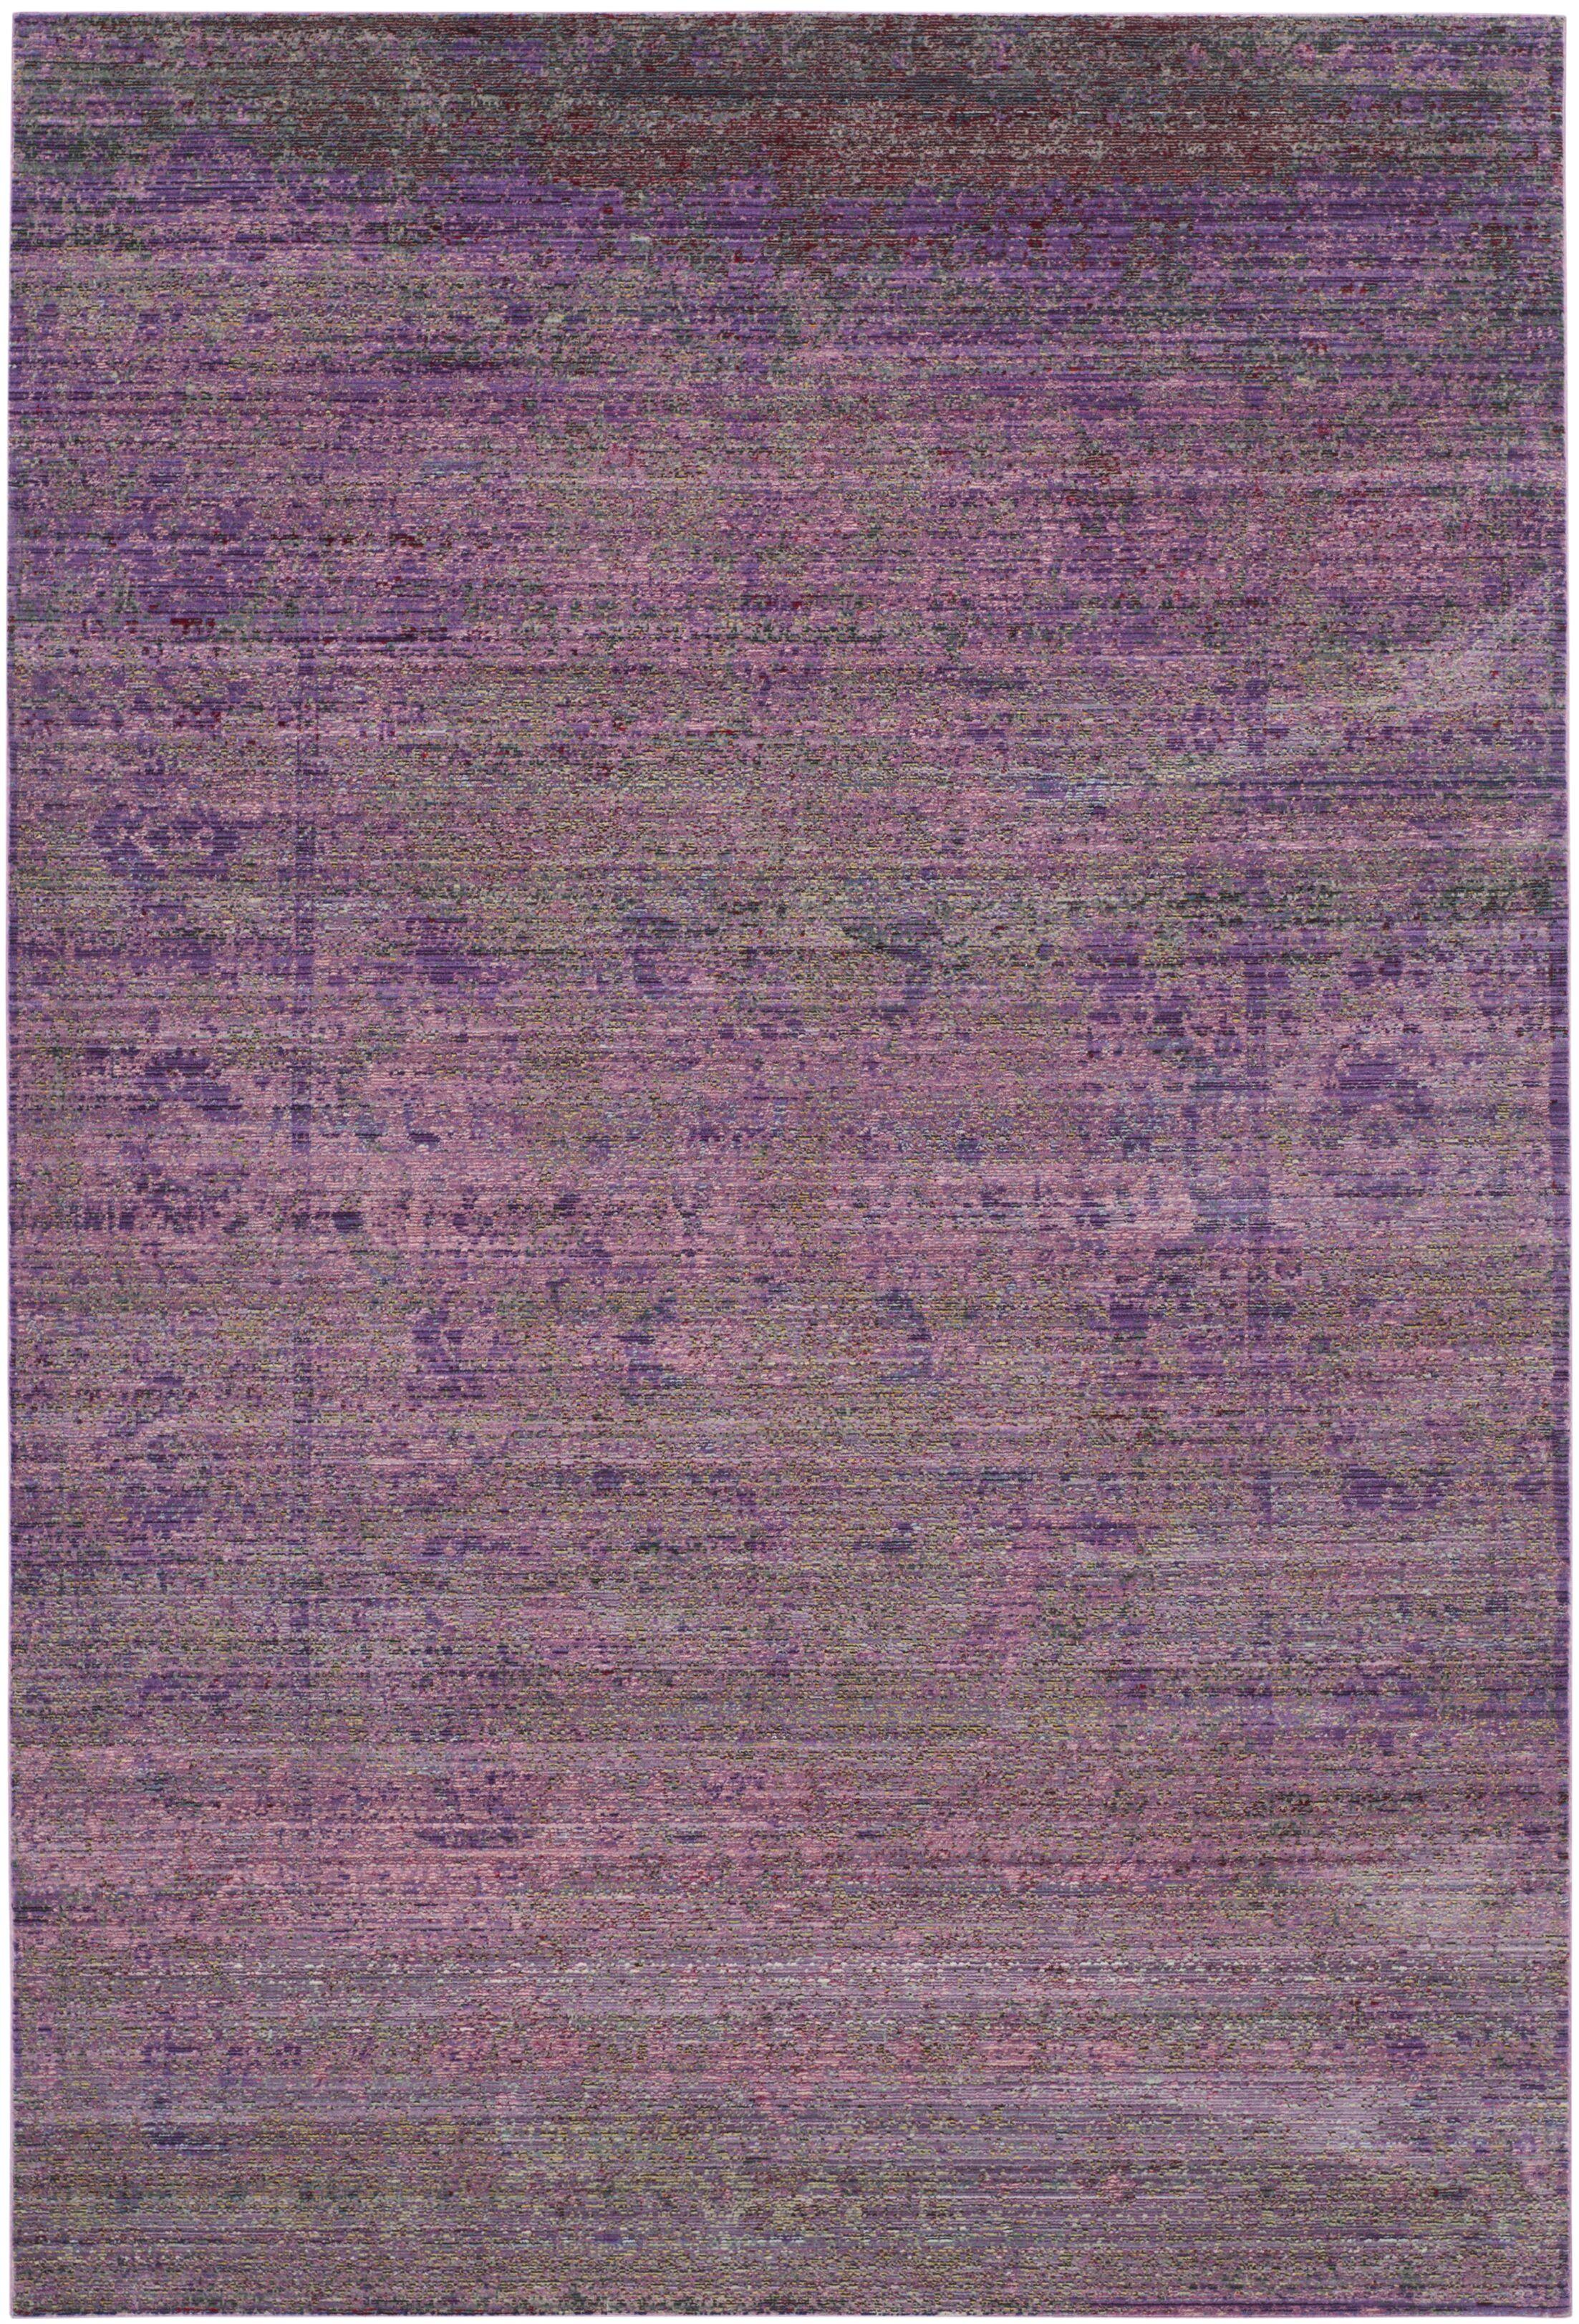 Doline Purple Area Rug Rug Size: Rectangle 5' x 8'